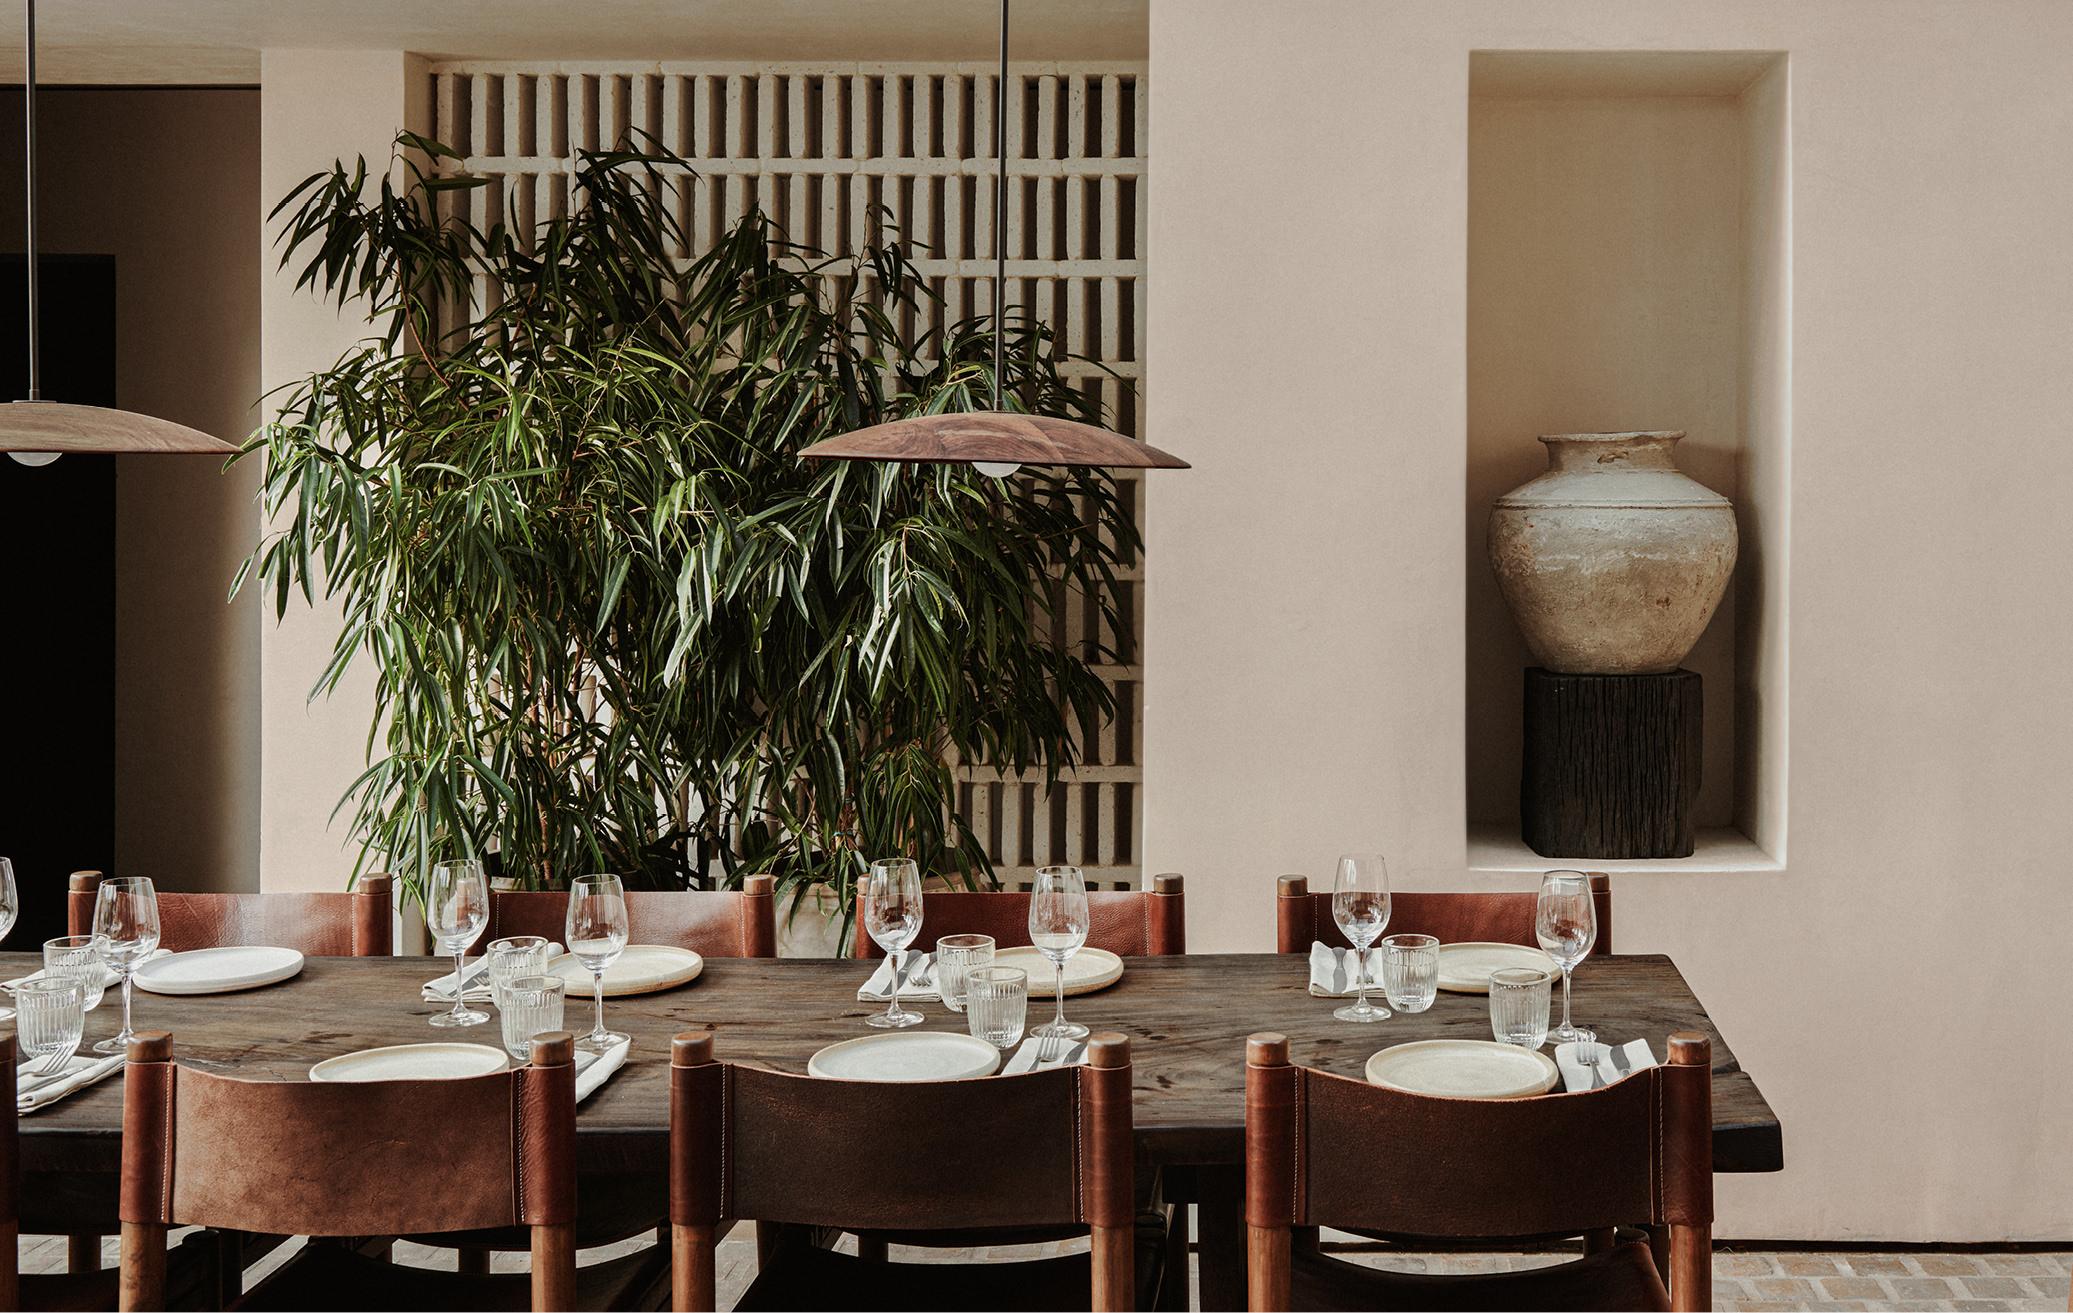 greek restaurant mykonos michelin star food and drink Mediterranean food cuisine table set up